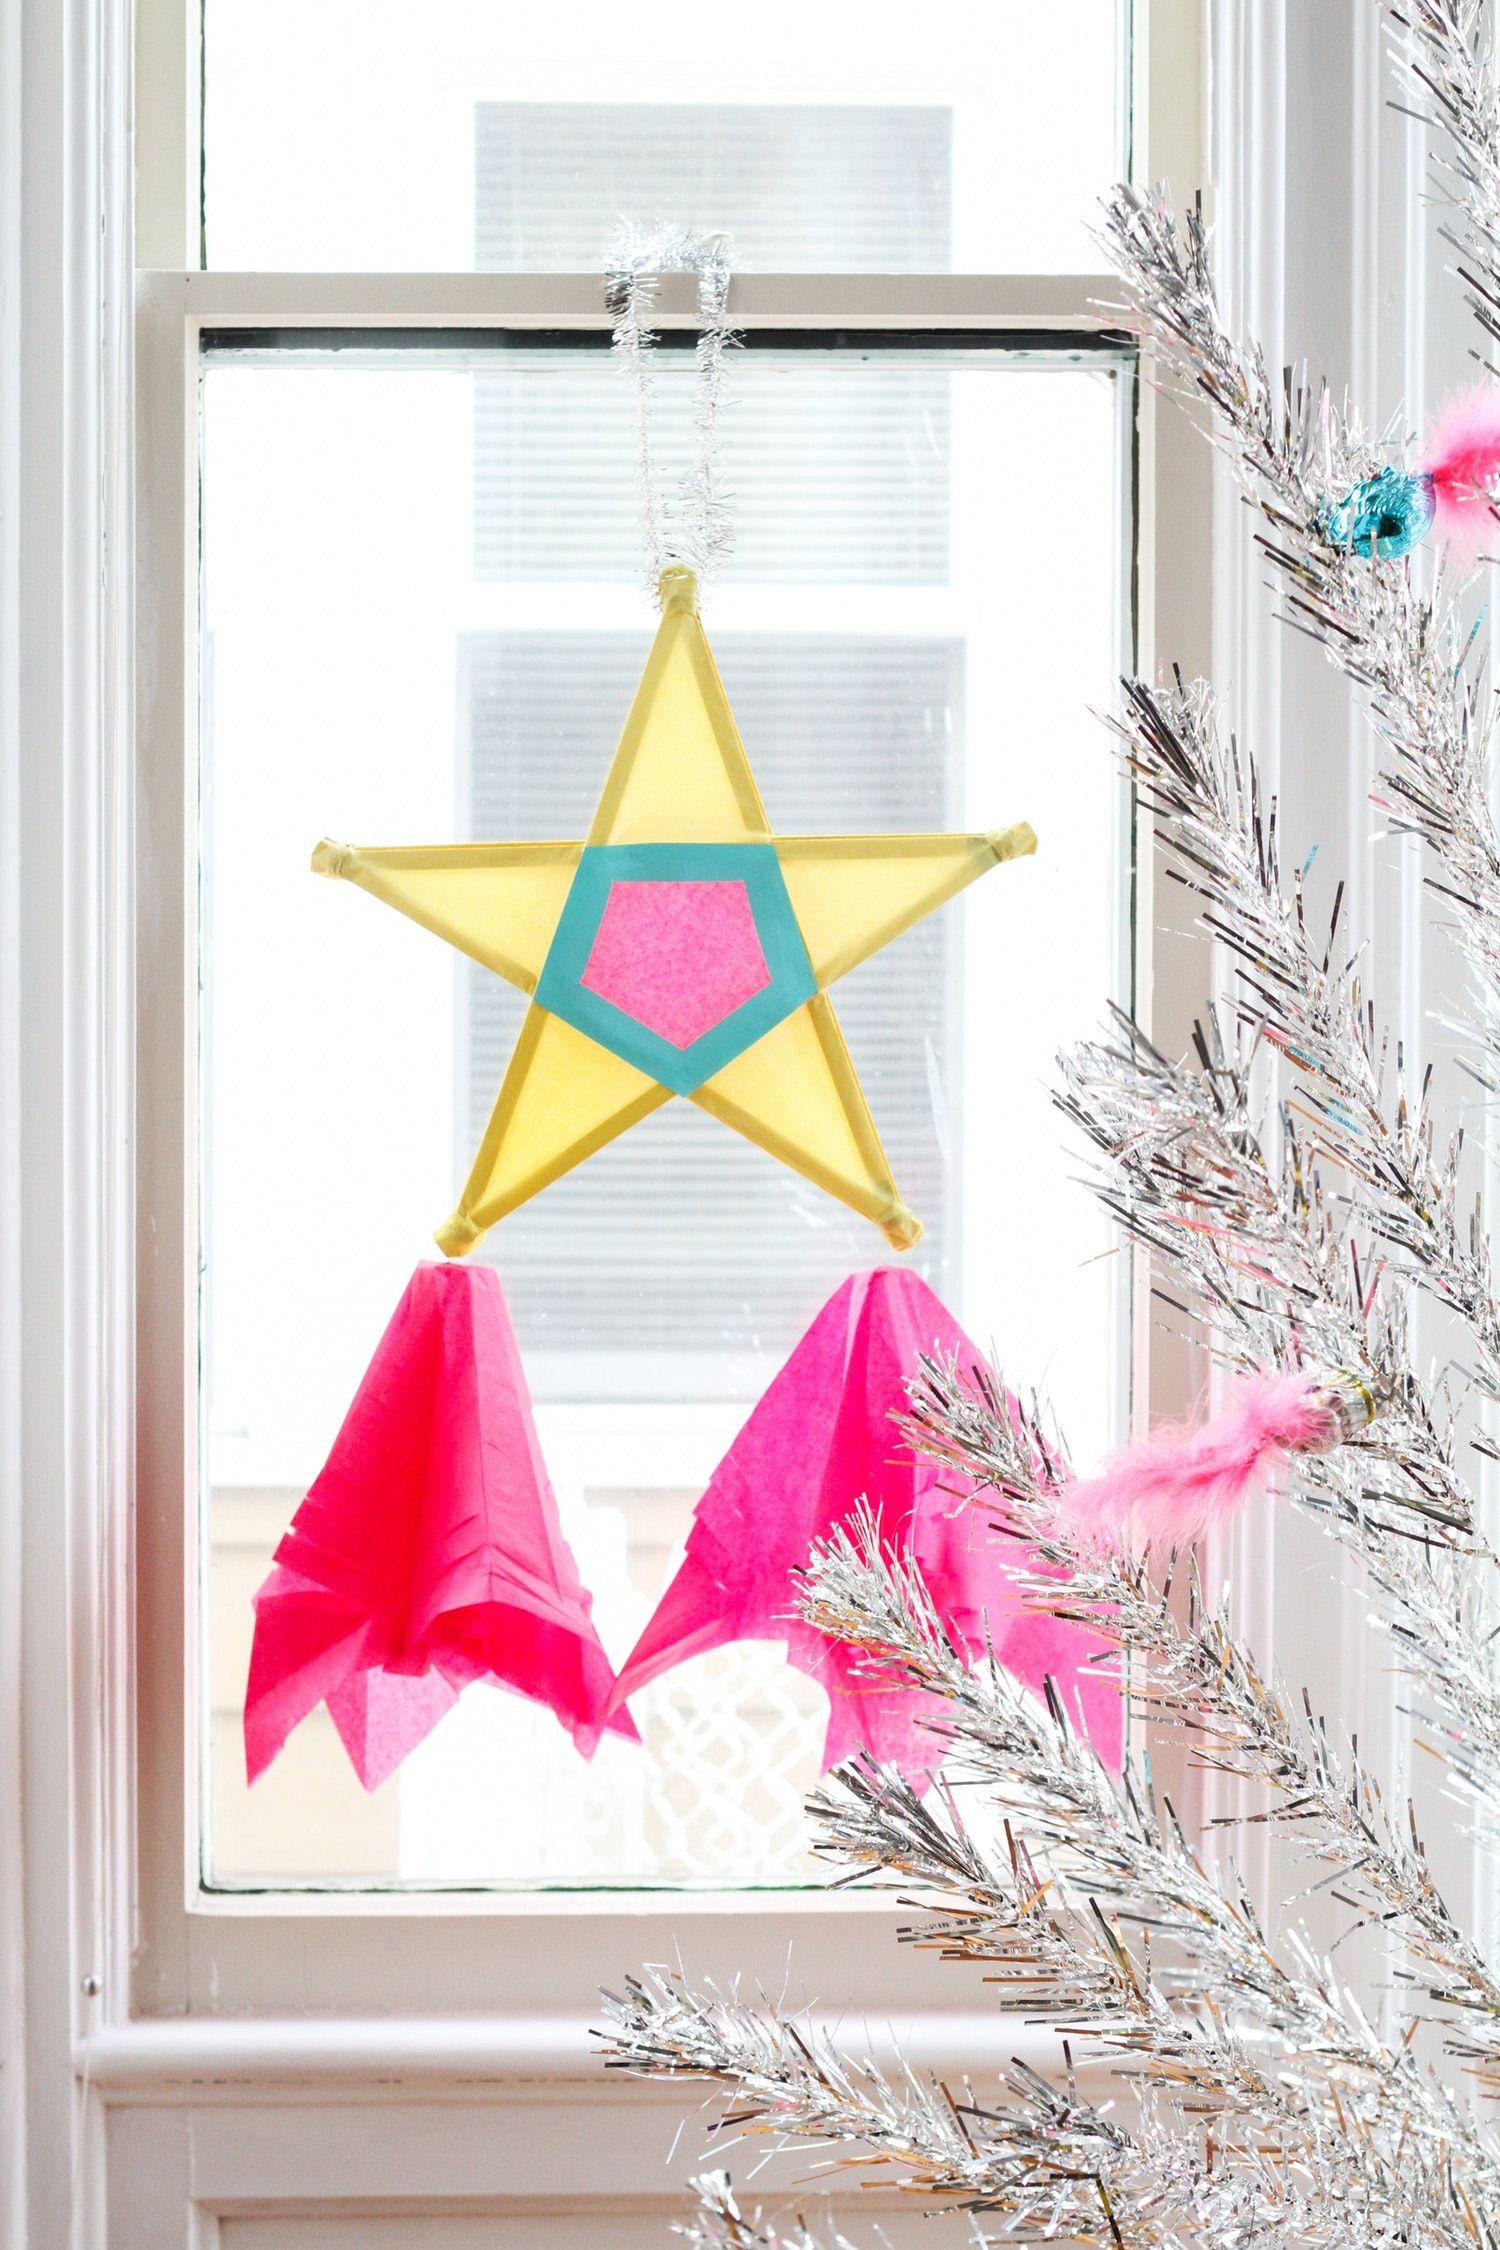 how to make a filipino christmas star apartment therapy tutorials - Filipino Christmas Star